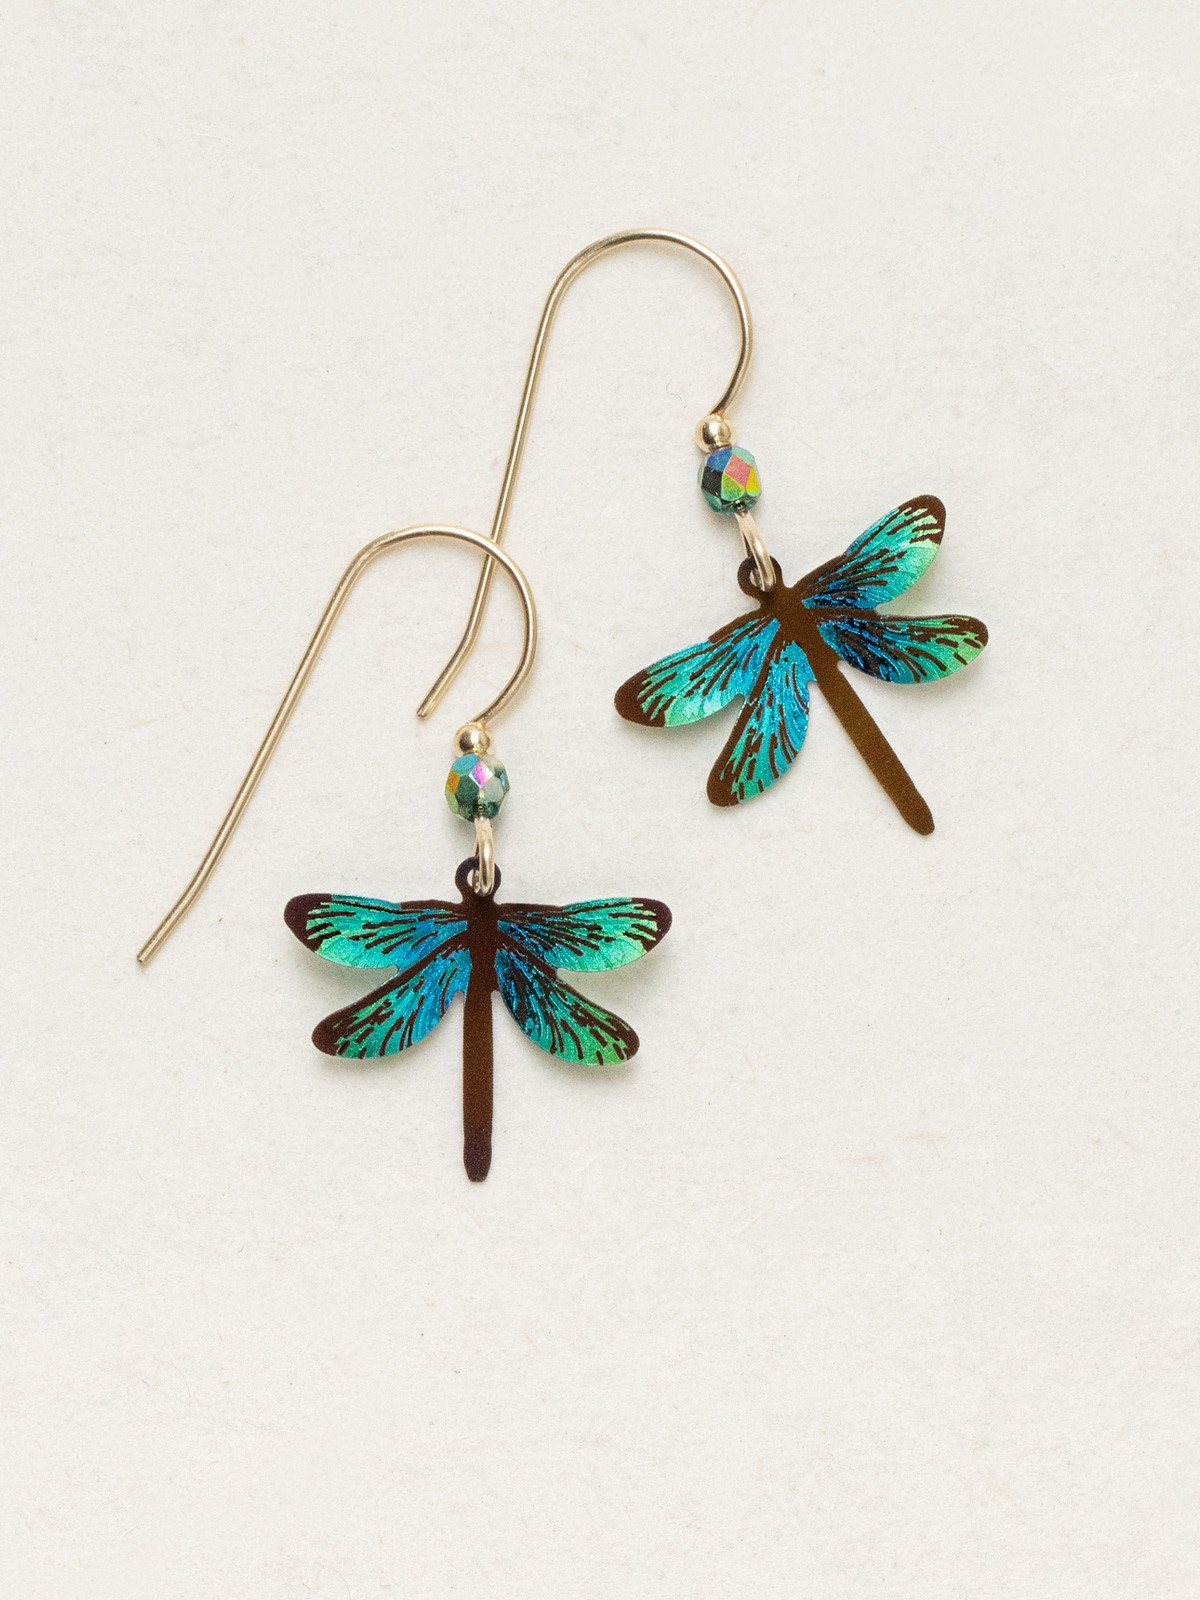 Holly Yashi dragonfly earrings